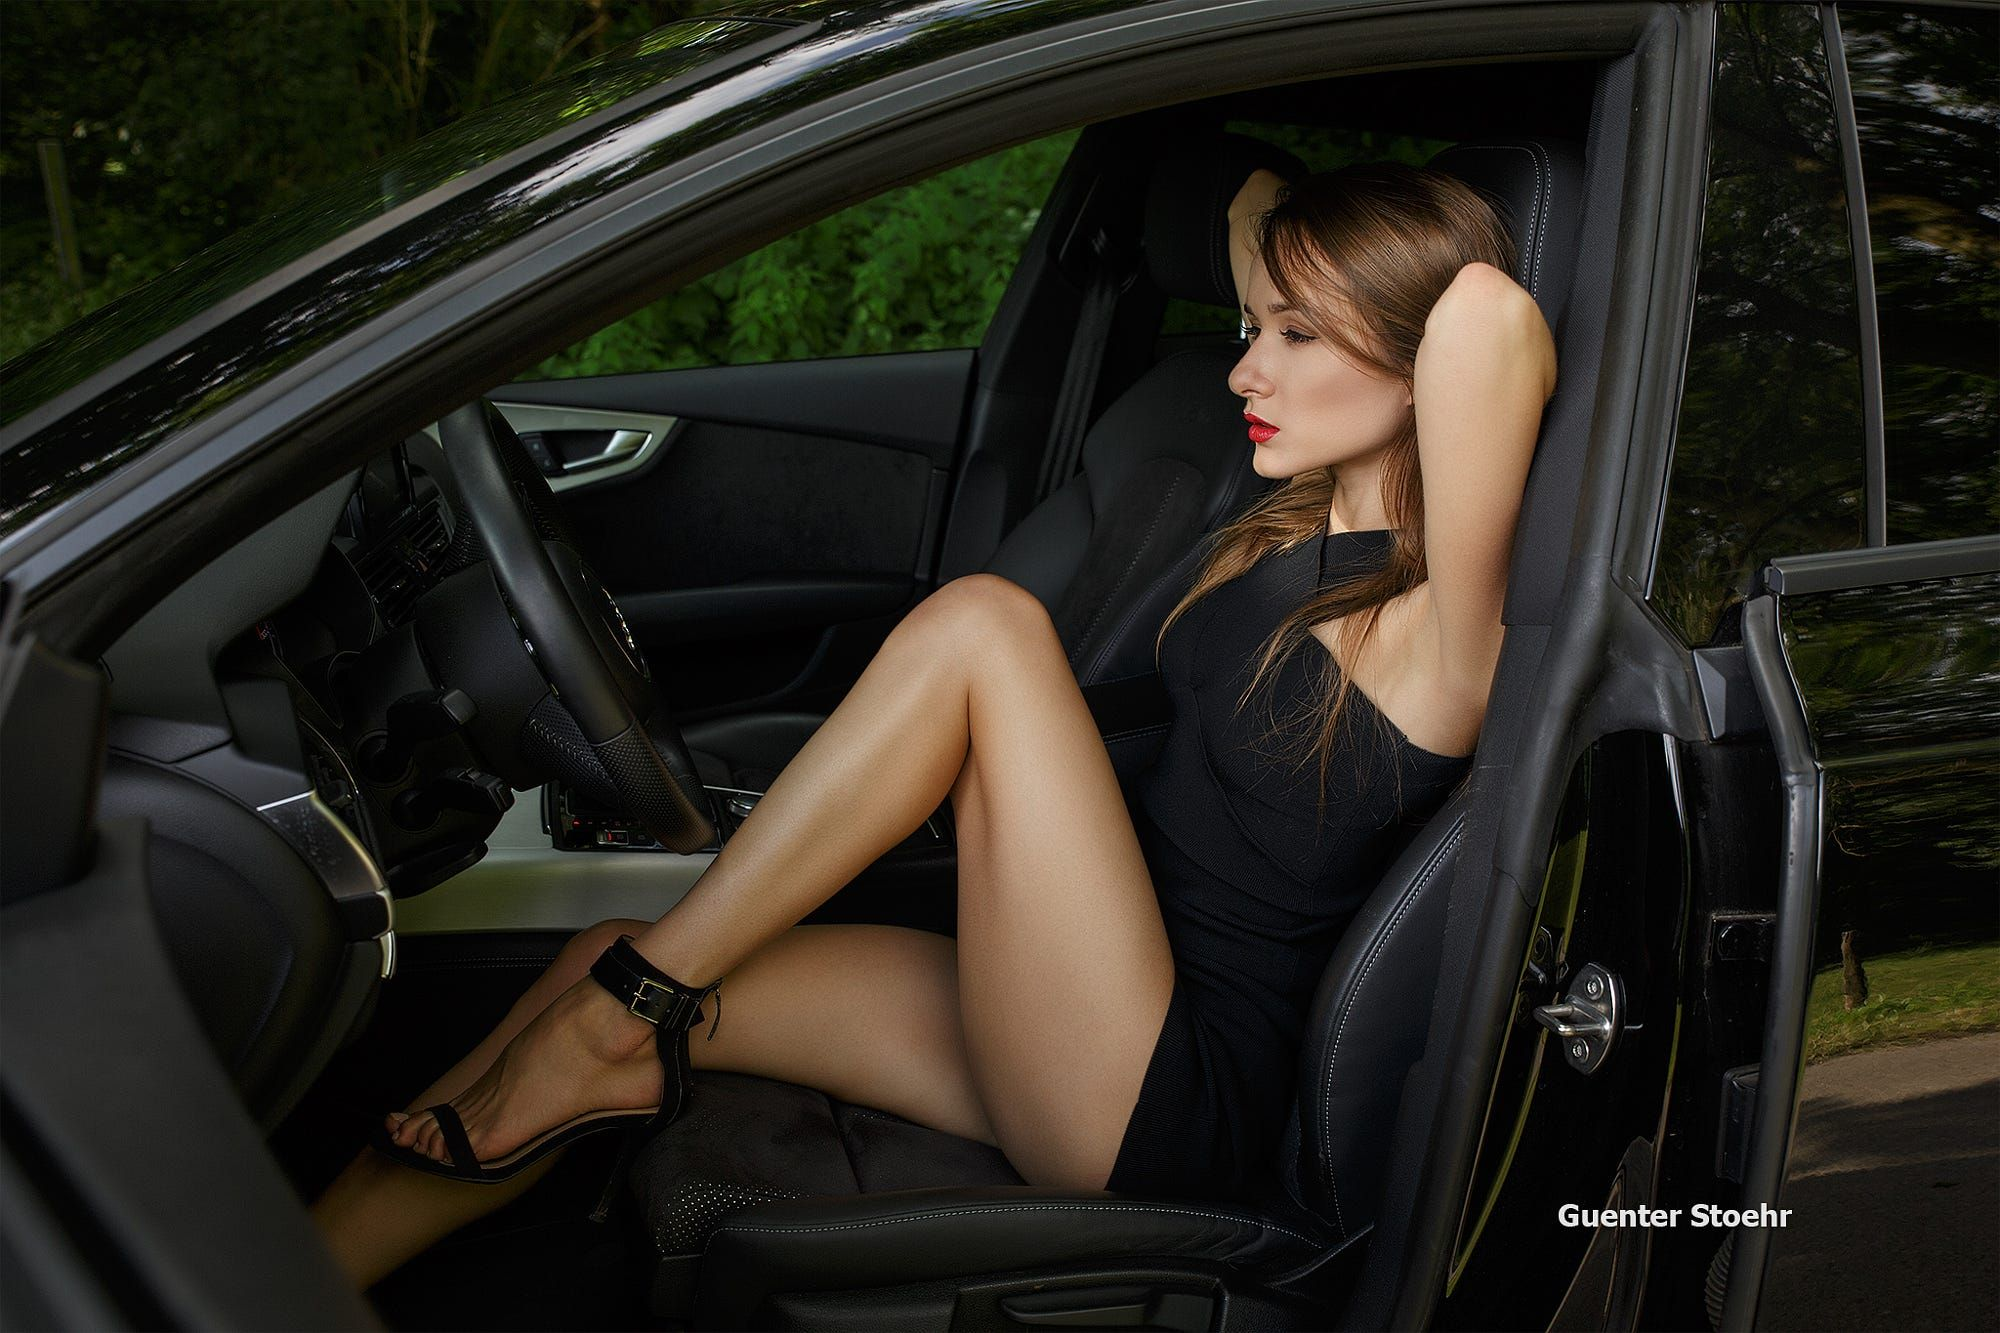 Vita by Guenter Stoehr on 500px | Women & Girls (посиделки ...